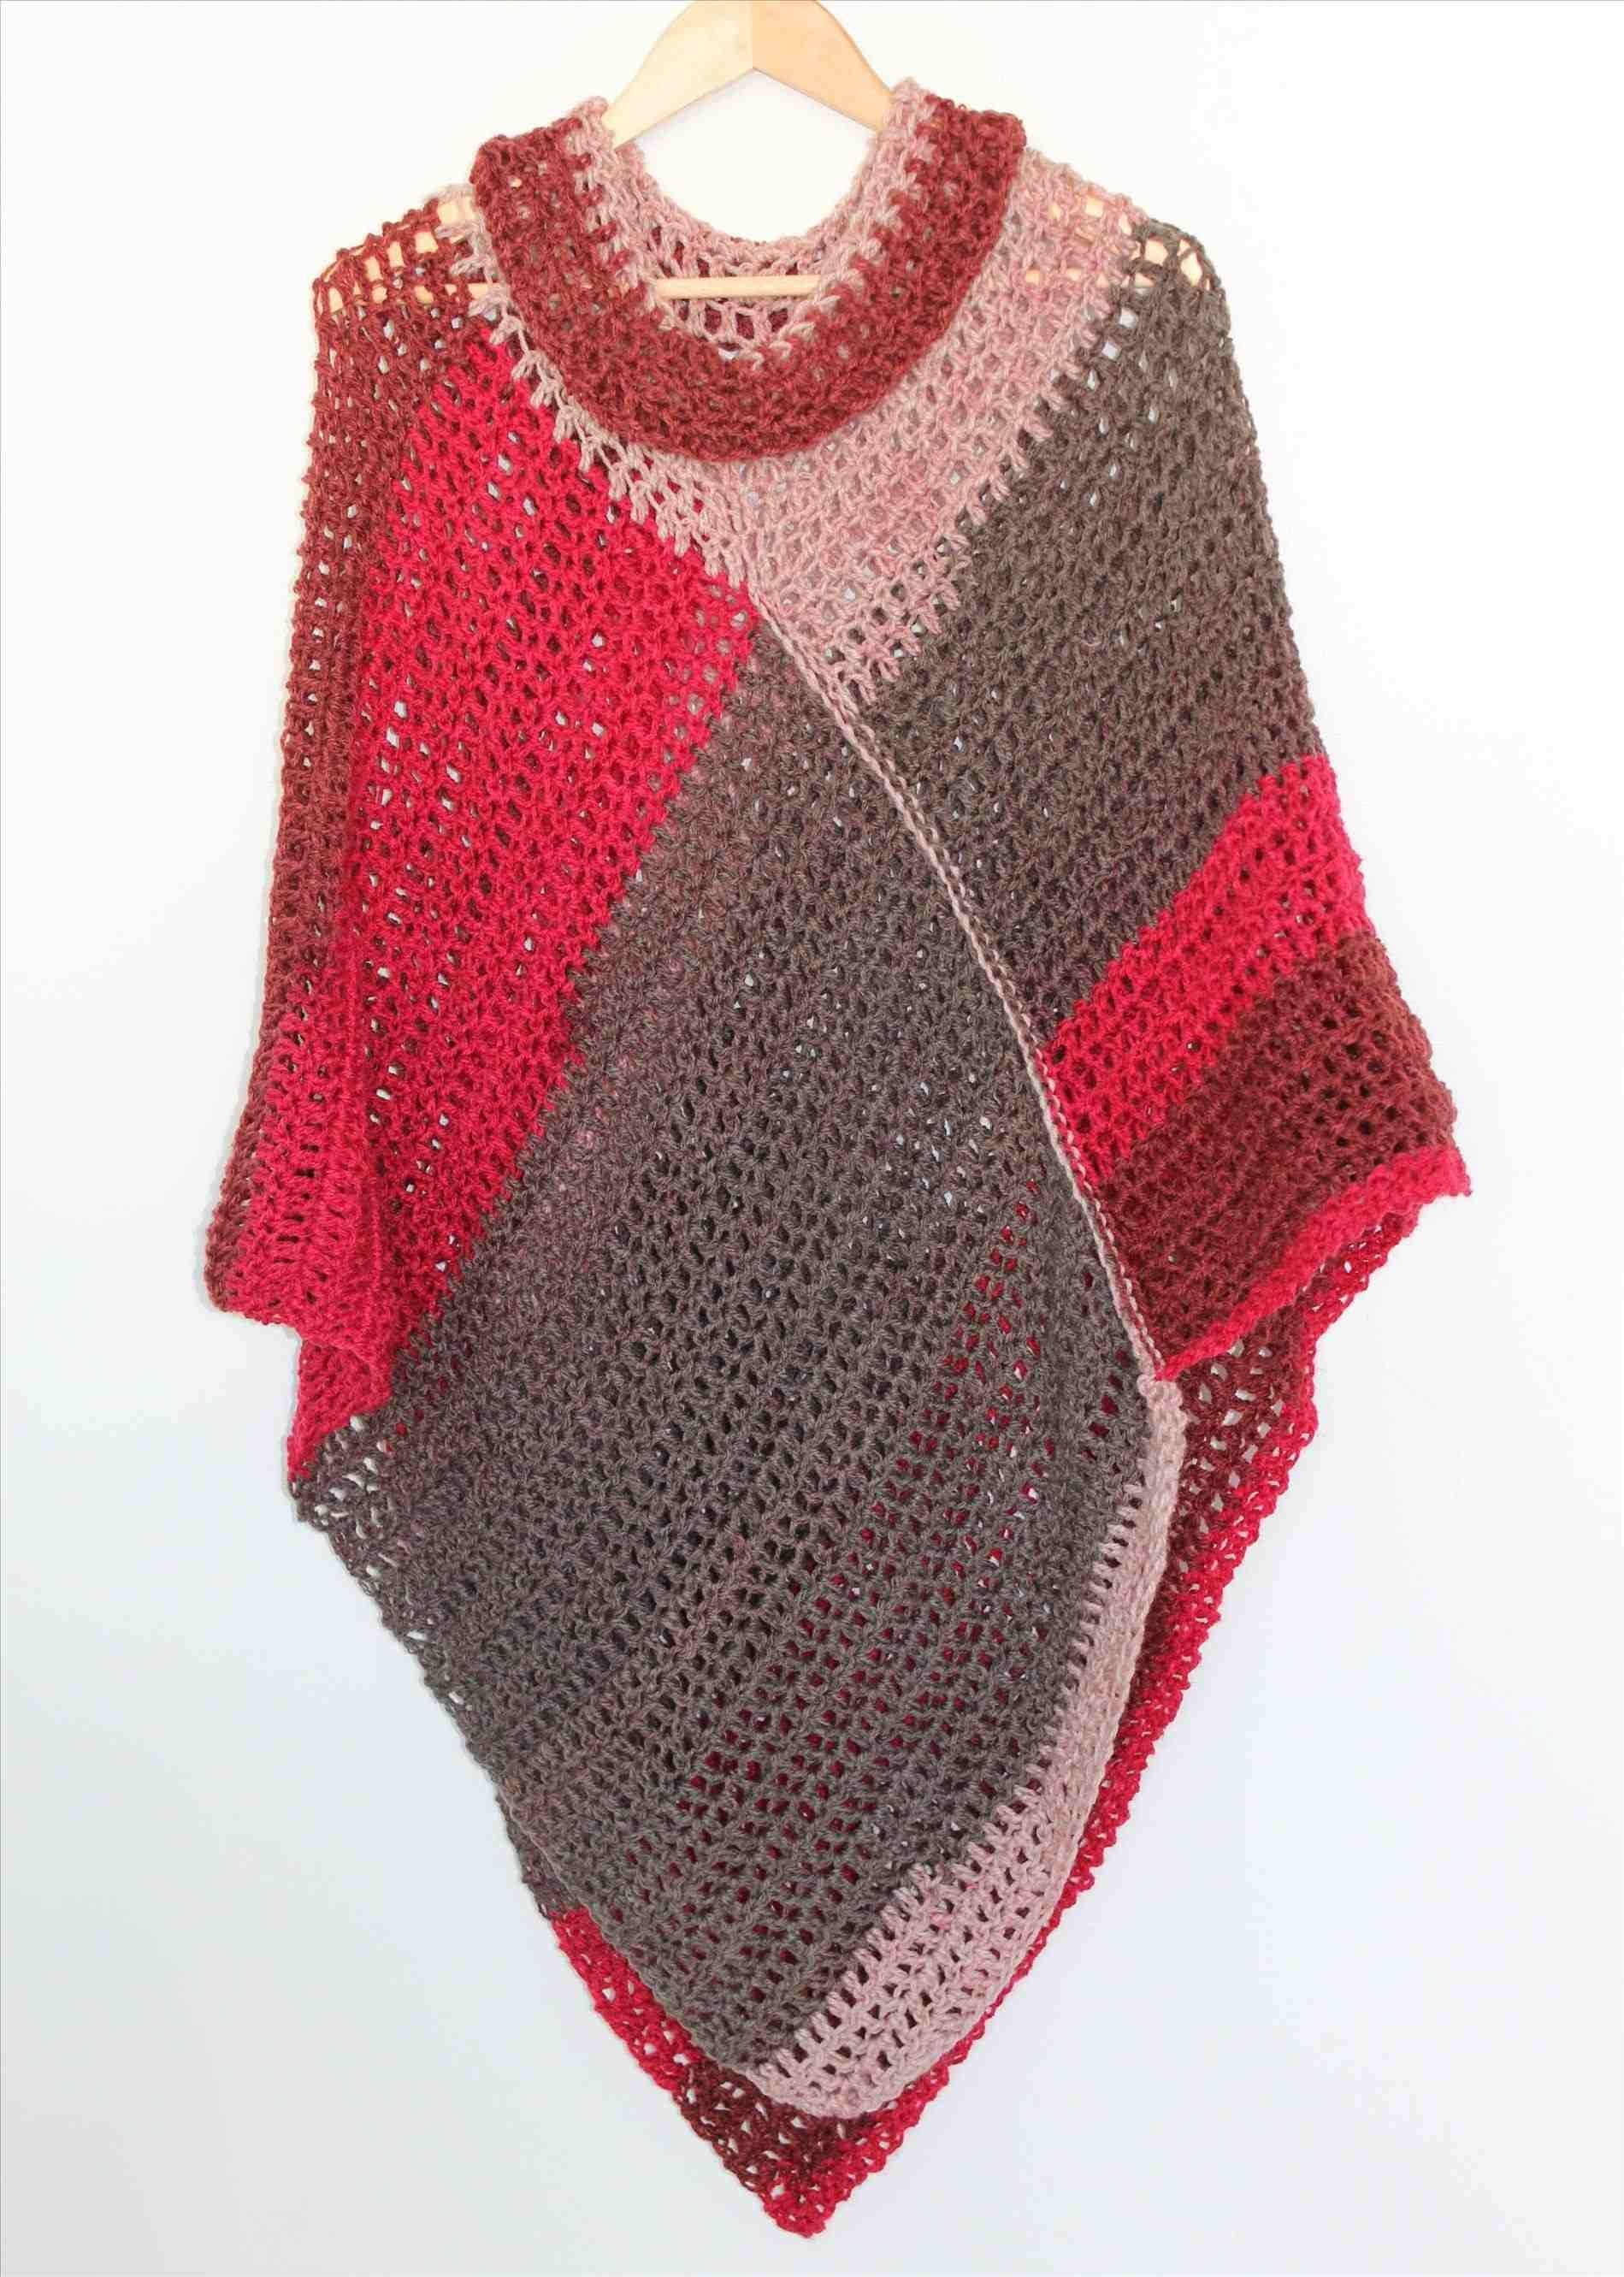 Crochet Bralette Pattern Lace Halter Bralette Multi Colors